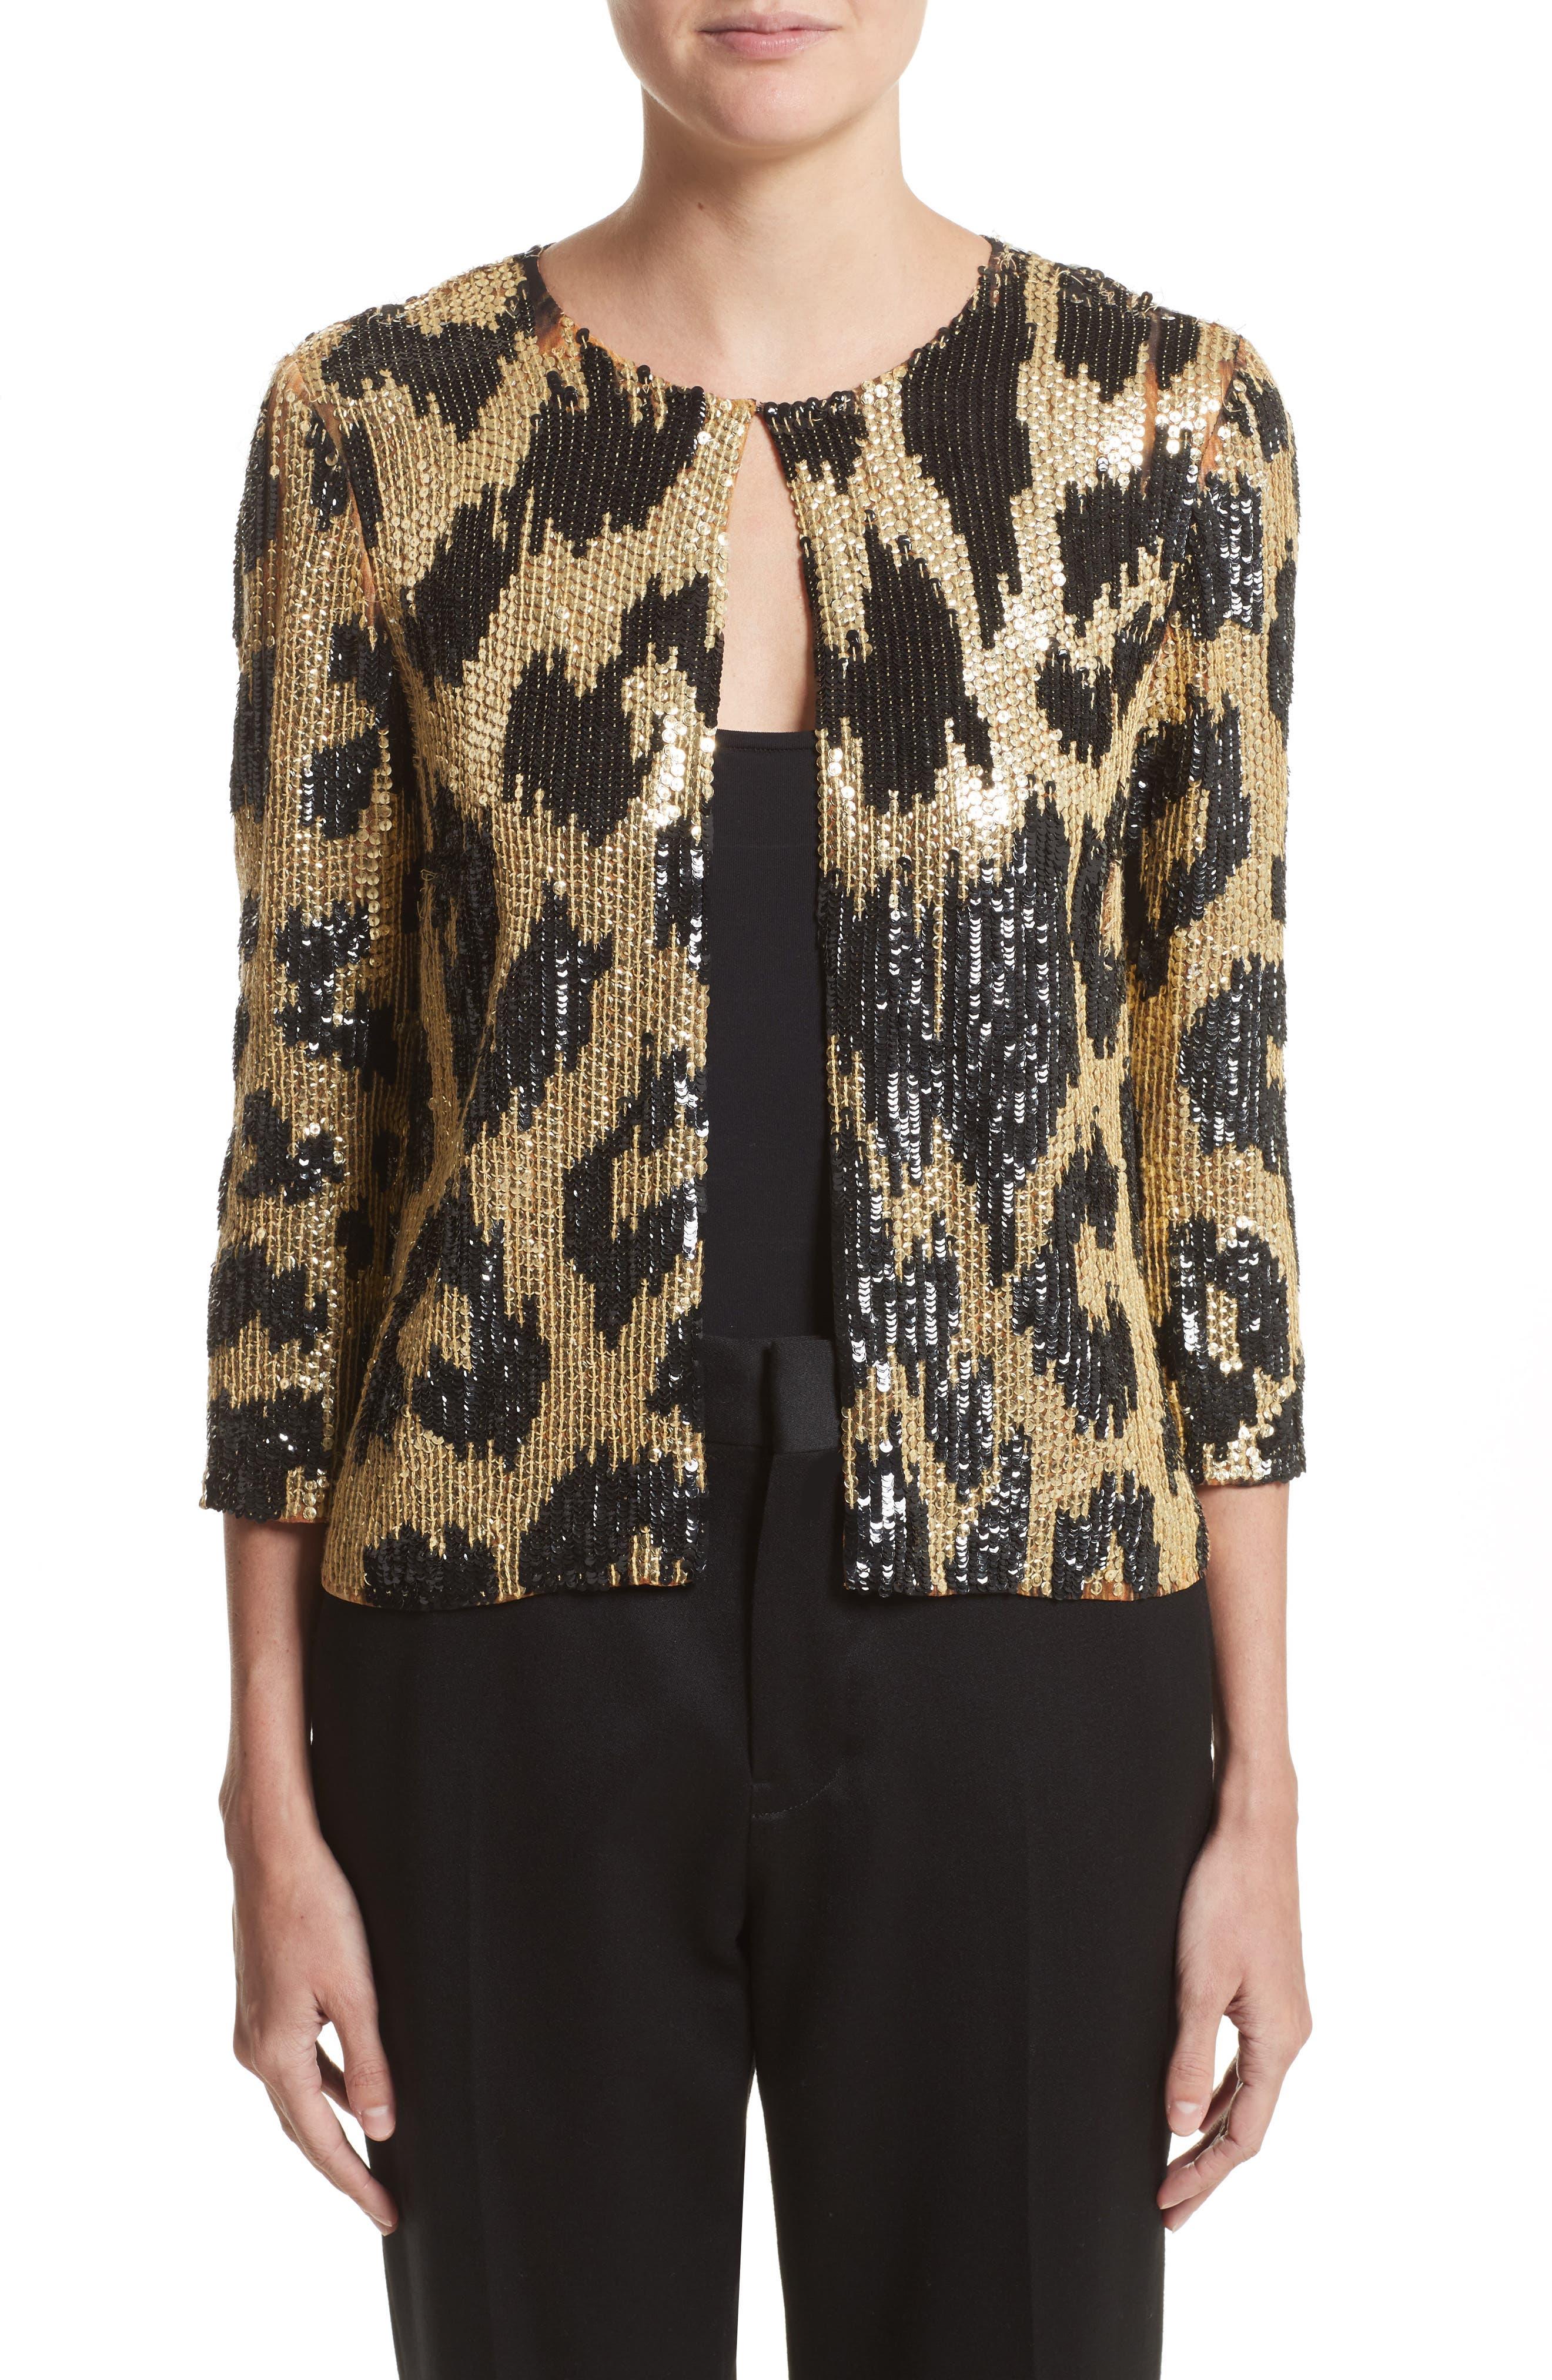 Main Image - Naeem Khan Cheetah Print Sequin Jacket